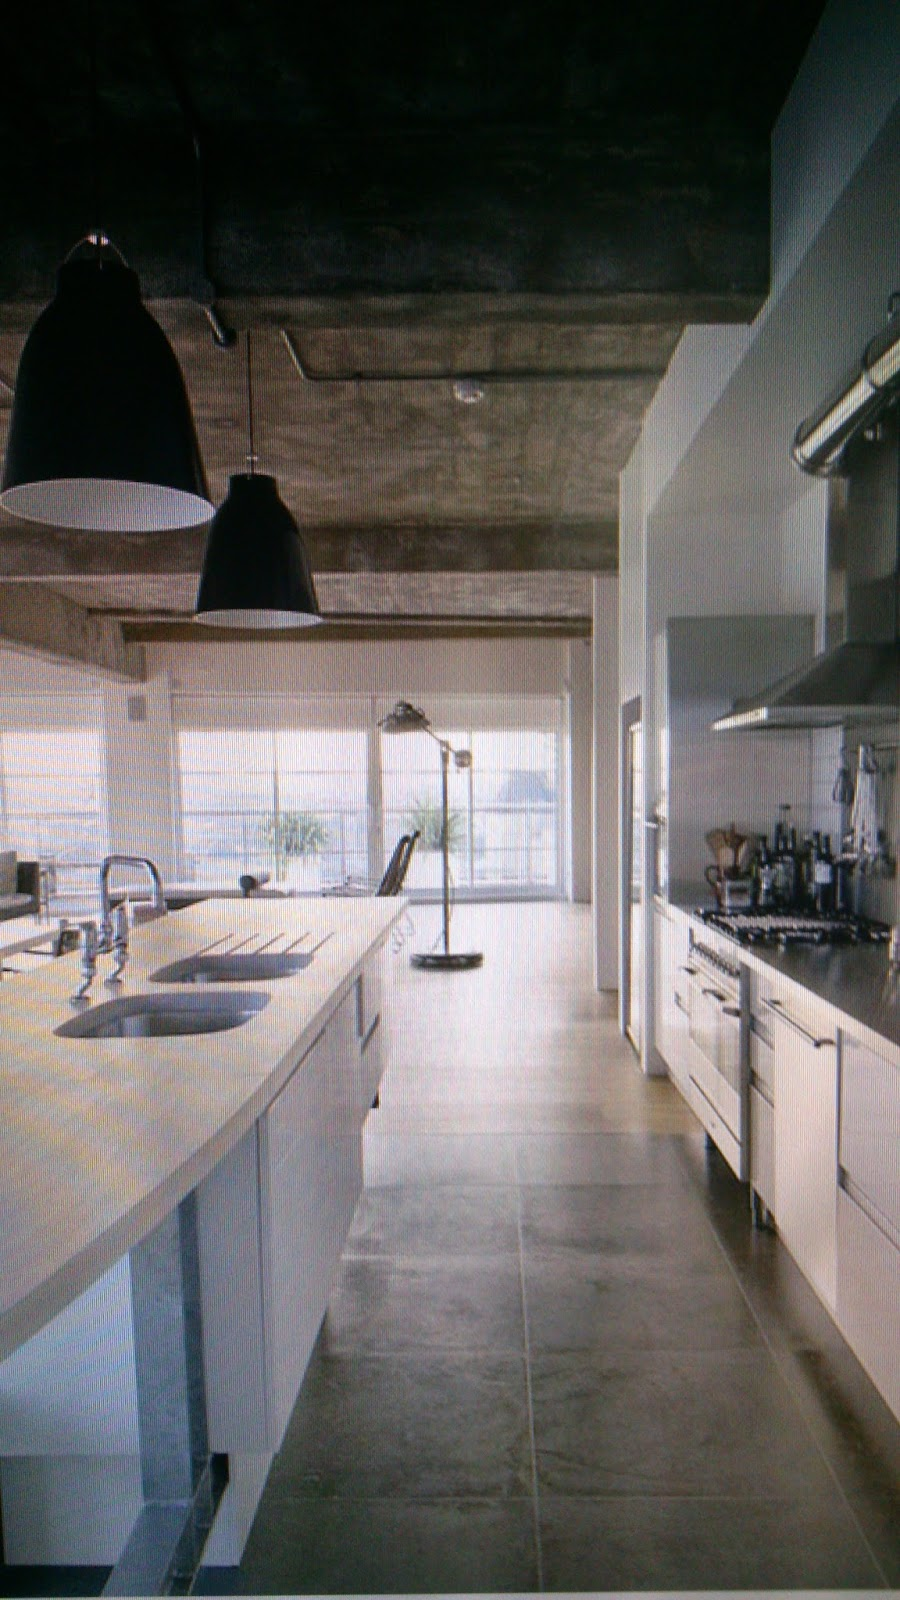 Bridoor s l cocina estilo industrial for Muebles de cocina estilo industrial